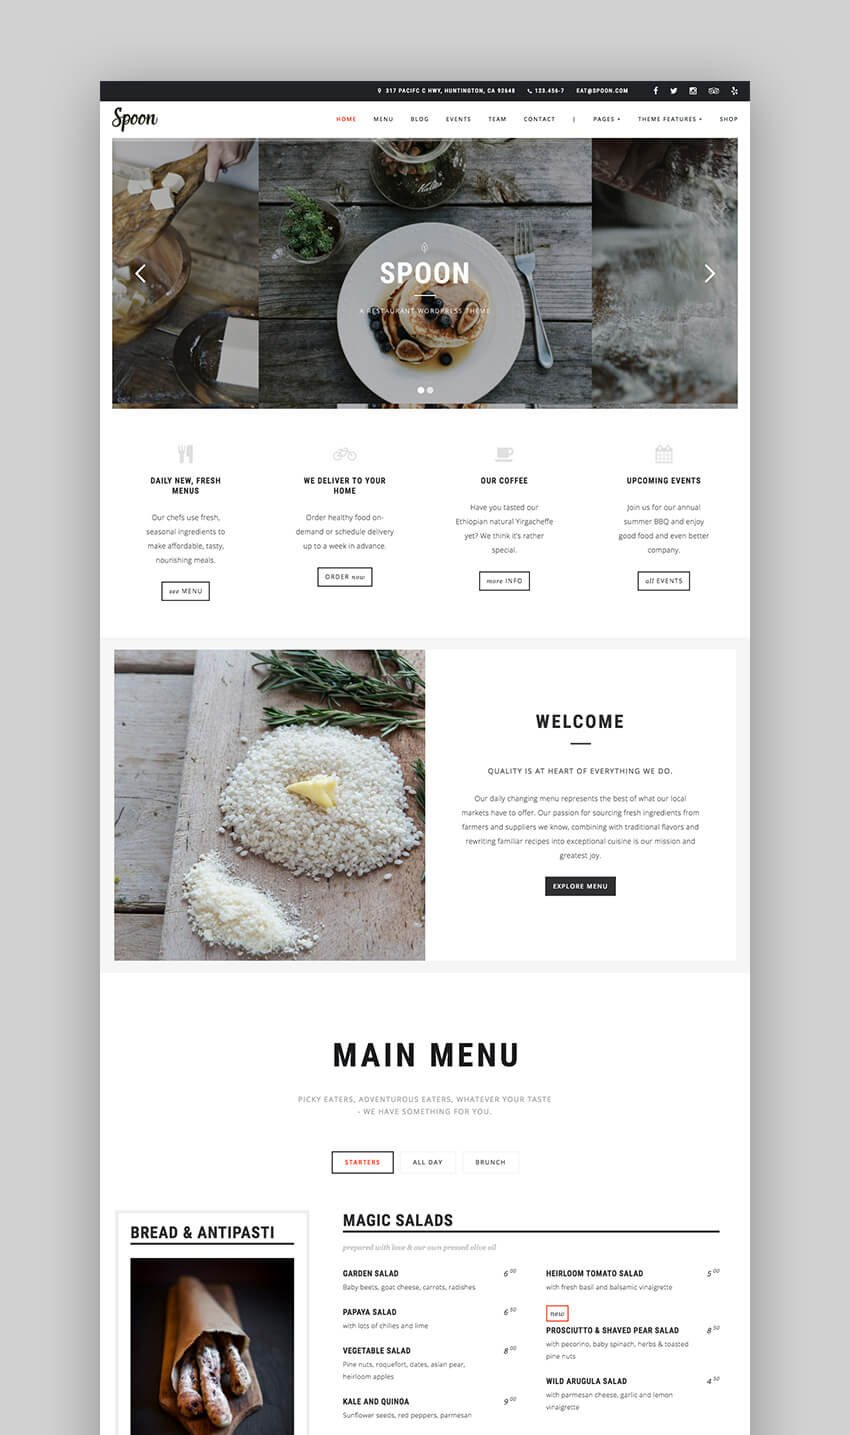 Spoon - Premium Responsive Restaurant WordPress Theme